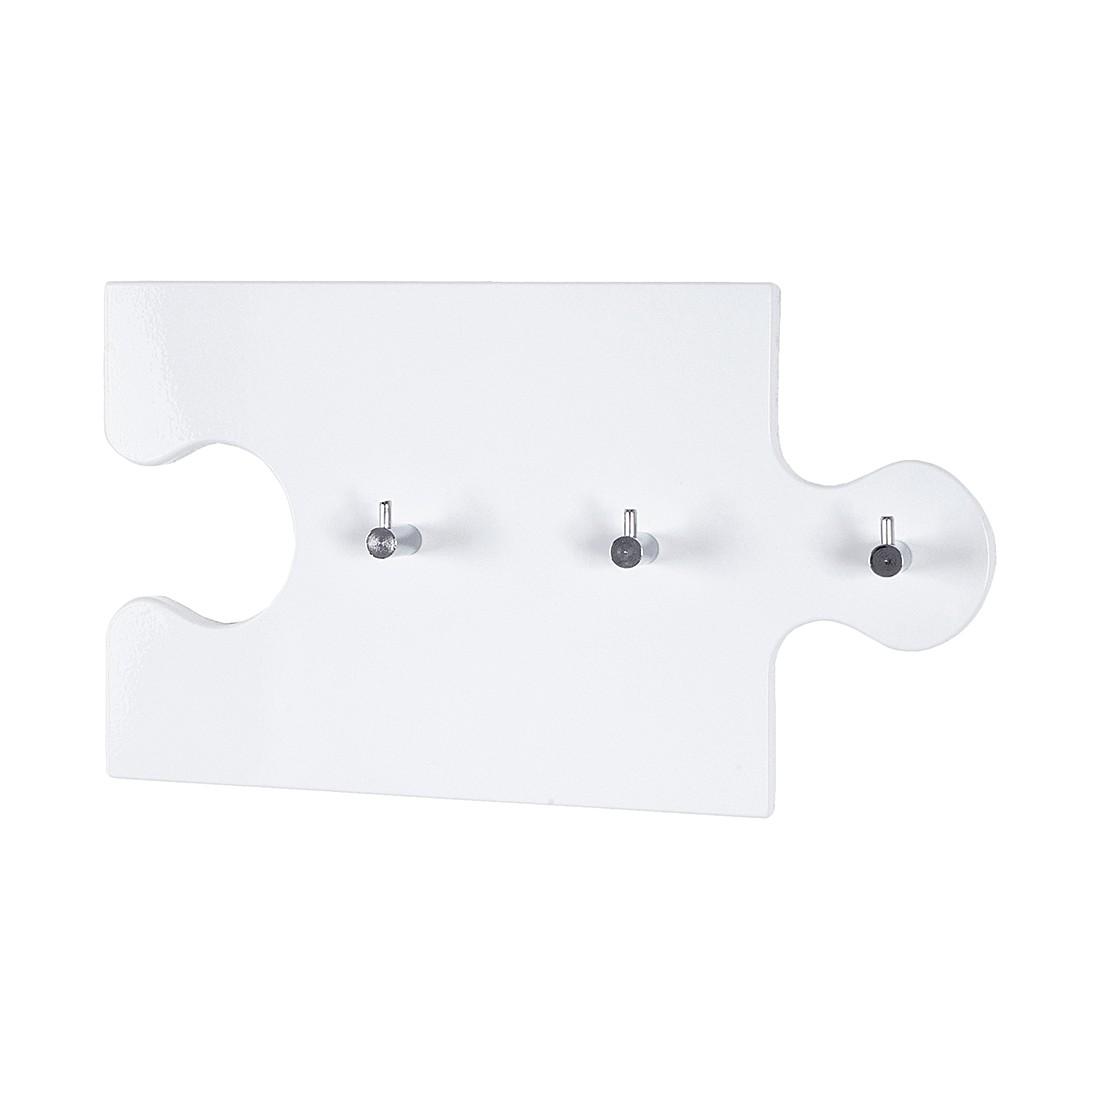 Wandgarderobe Oscar – Hochglanz Weiß/Chrom, Home Design kaufen